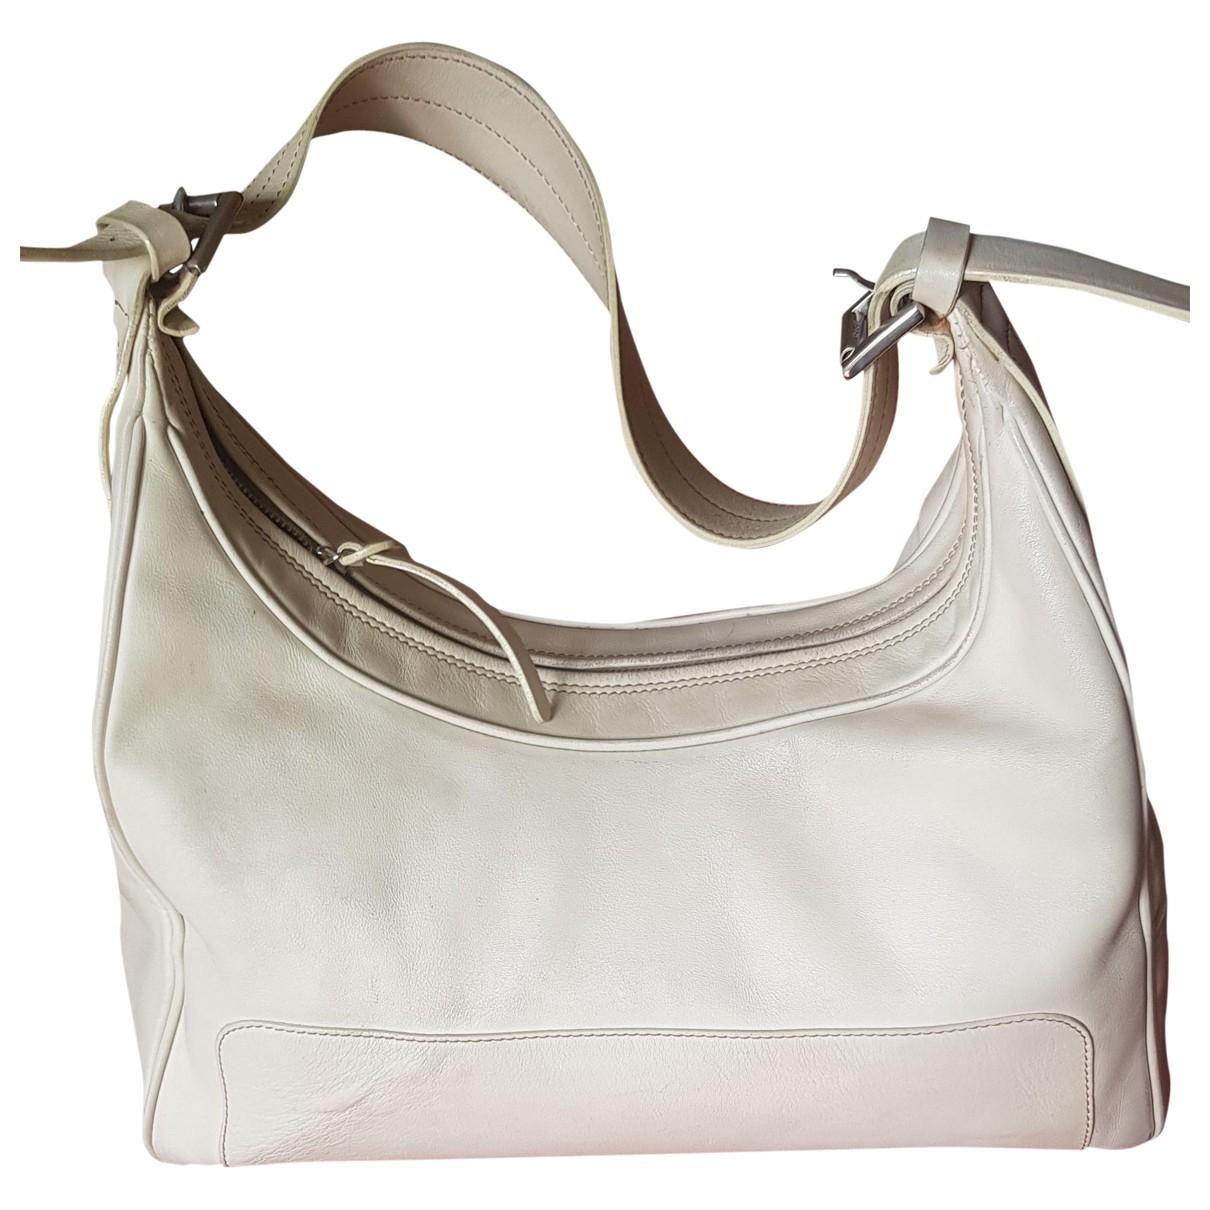 Hogan \N Handtasche in  Beige Leder